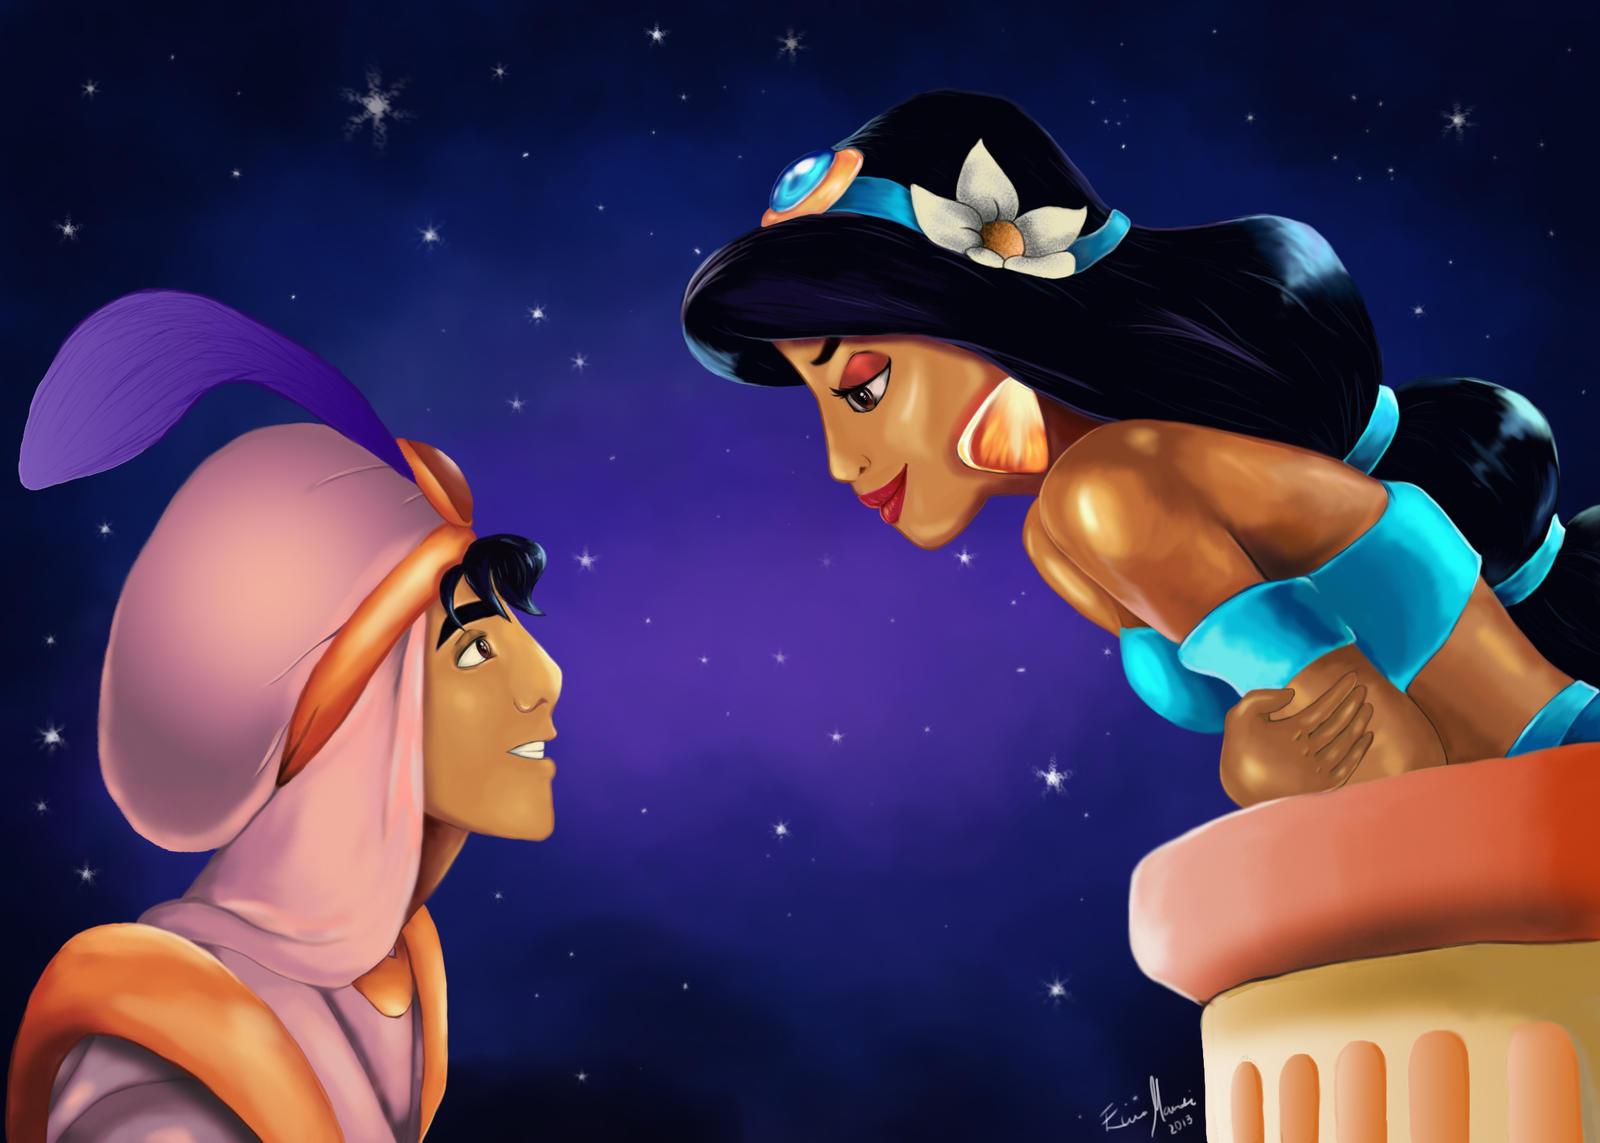 Aladdin and Jasmine - A Whole New World by eliselikesart